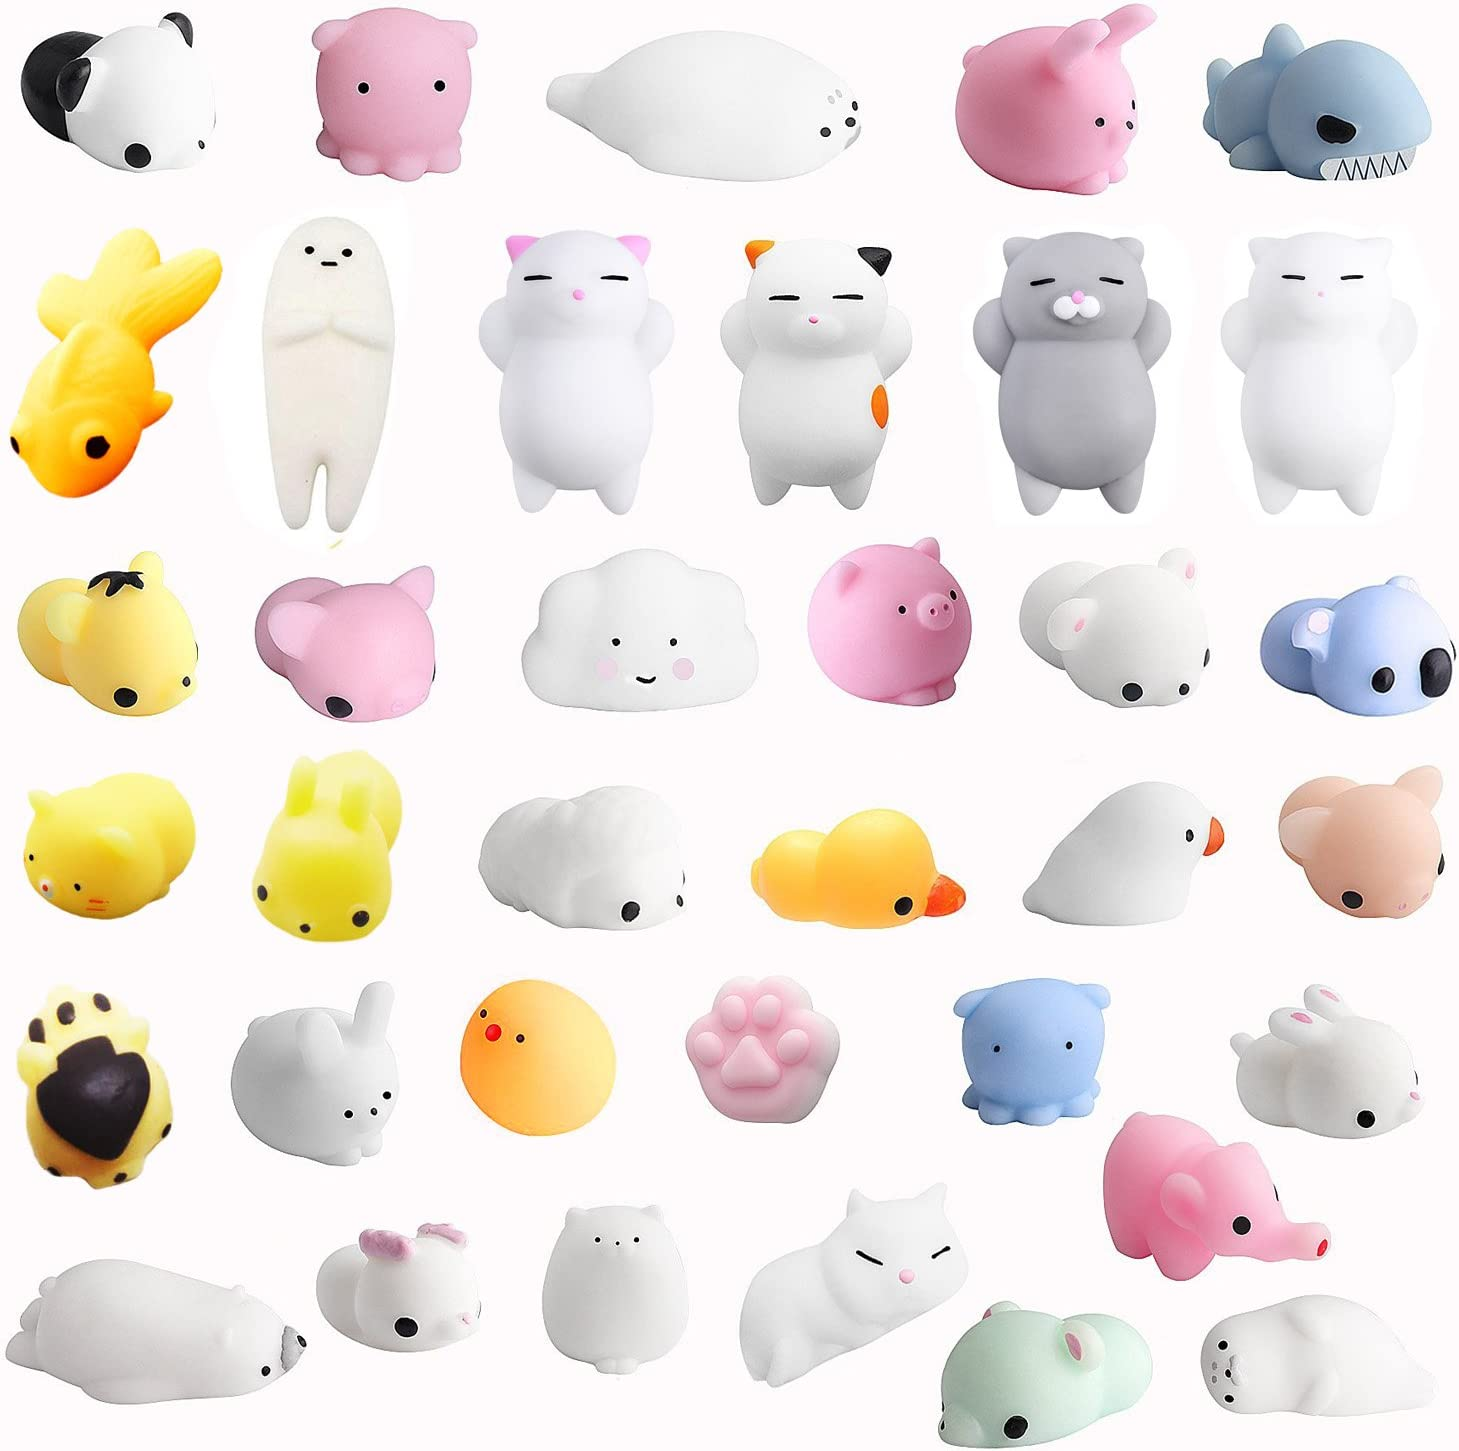 Monqi 36Pcs Squishys Kawaii Juguetes Pegajosos Oso Panda Gato de Silicona Animales Squishies (Multicolor)